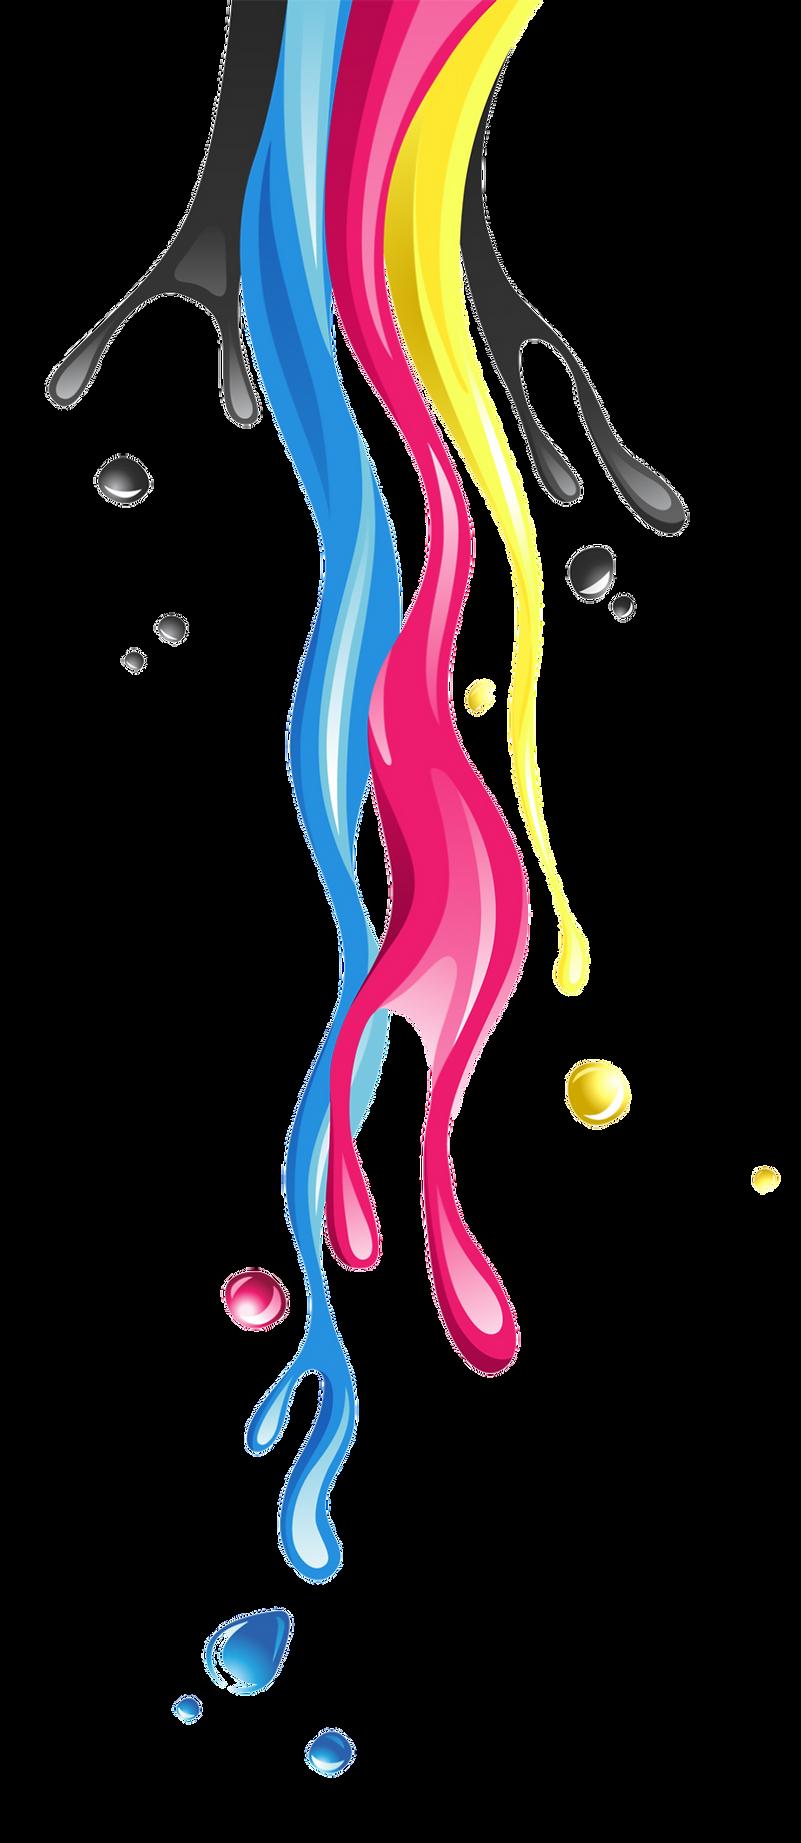 kisspng-cmyk-color-model-printing-paint-